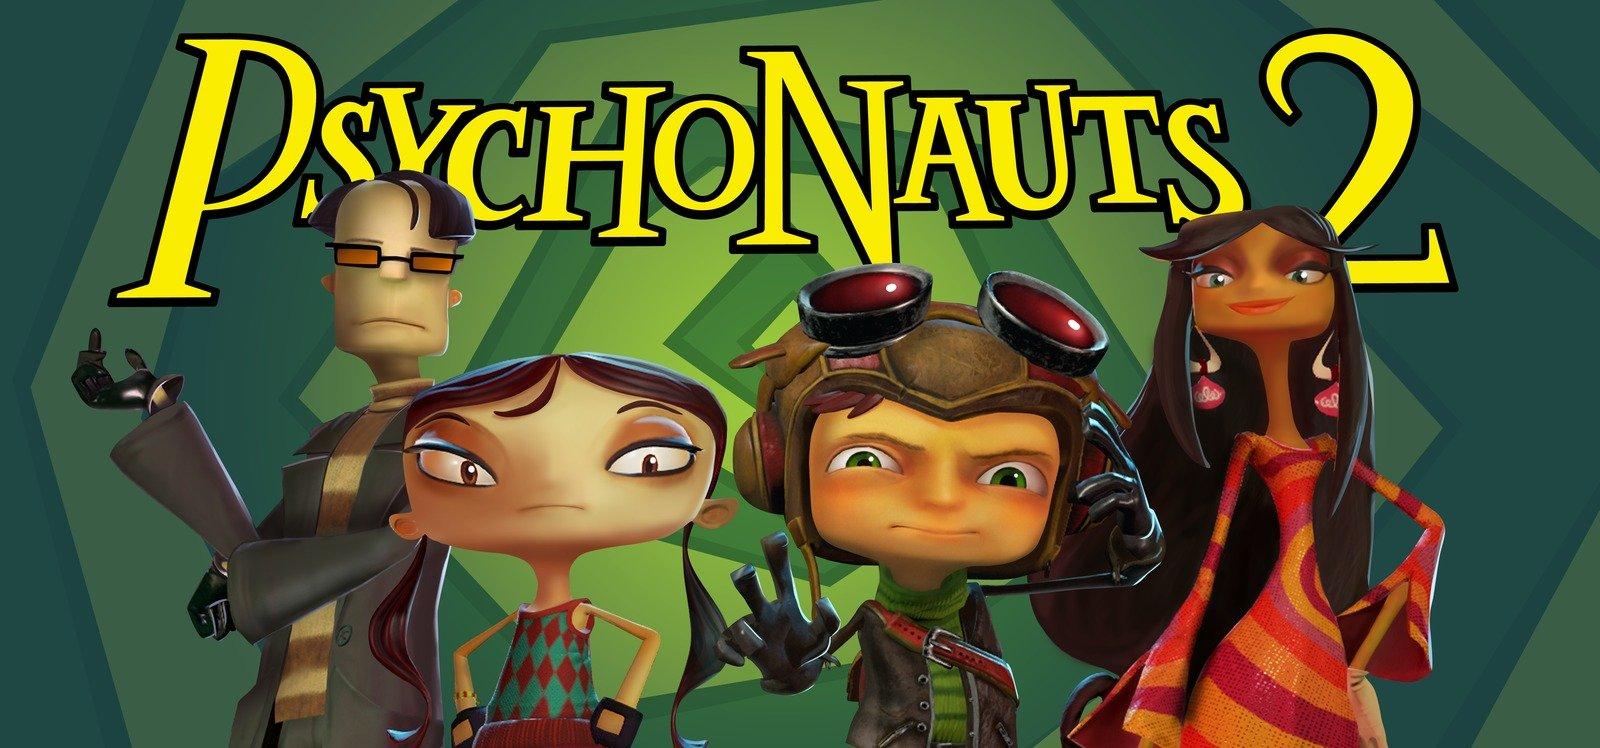 Psychonauts (2016) PC - Скриншот 1